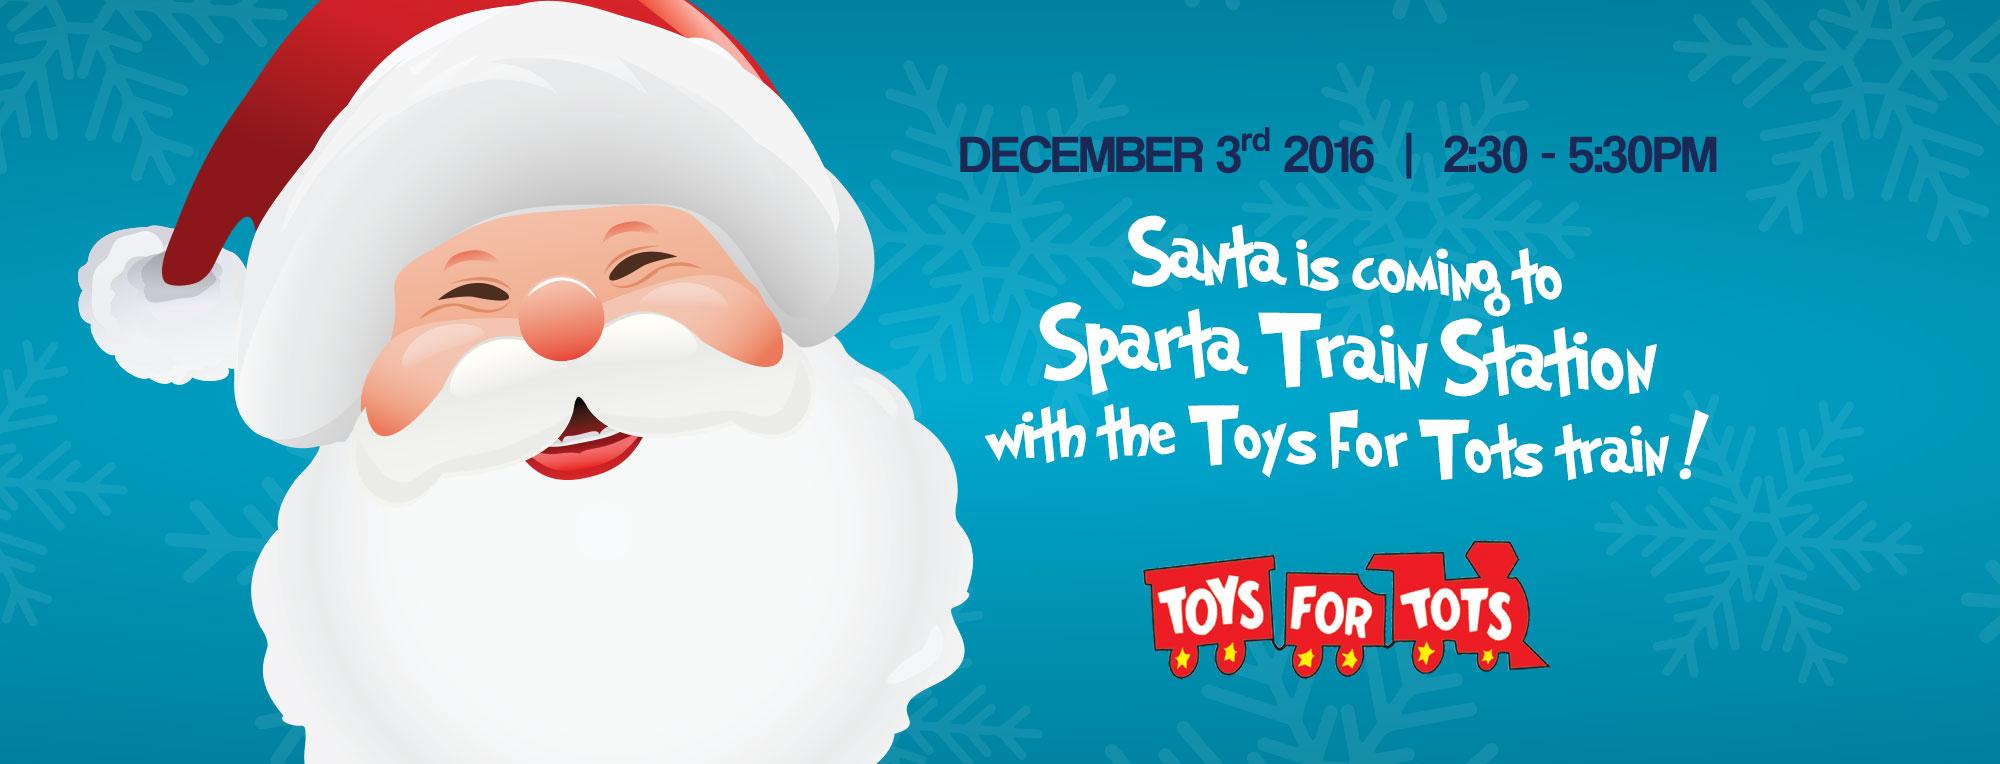 toysfortots-sparta